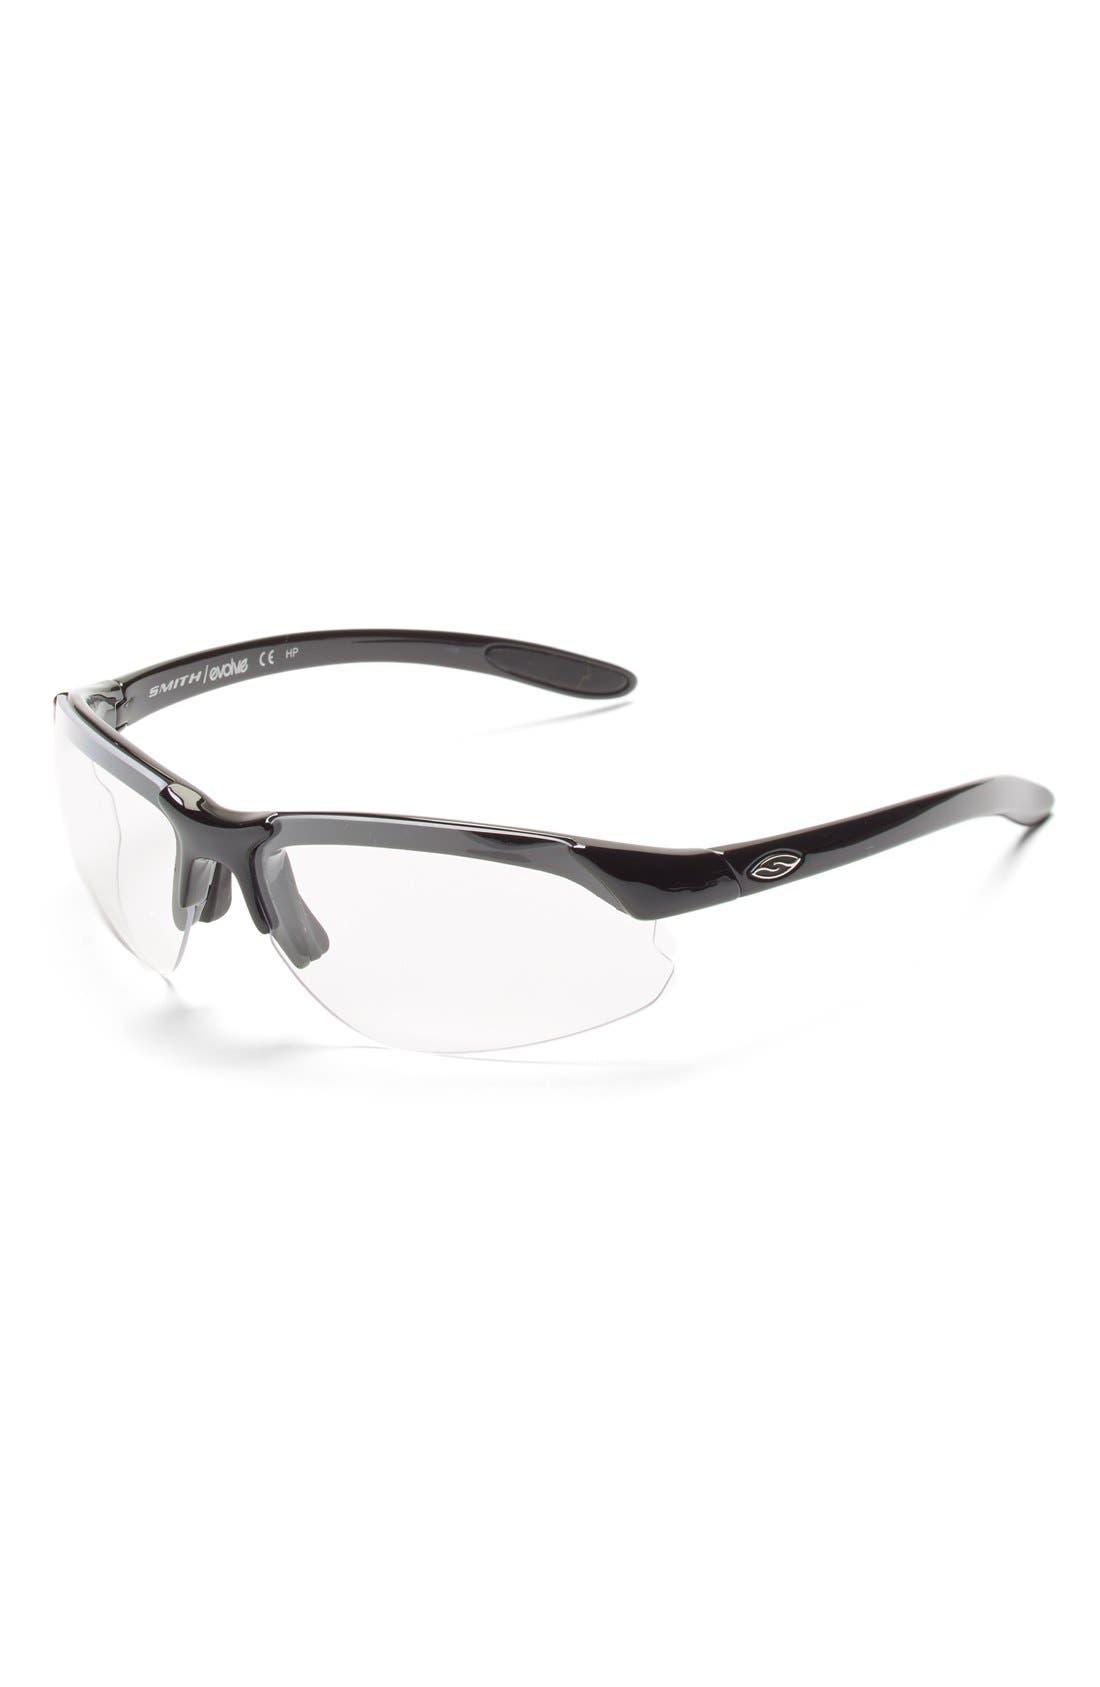 'Parallel DMax' 65mm Polarized Sunglasses,                             Alternate thumbnail 4, color,                             Black/ Polar Grey/ Clear